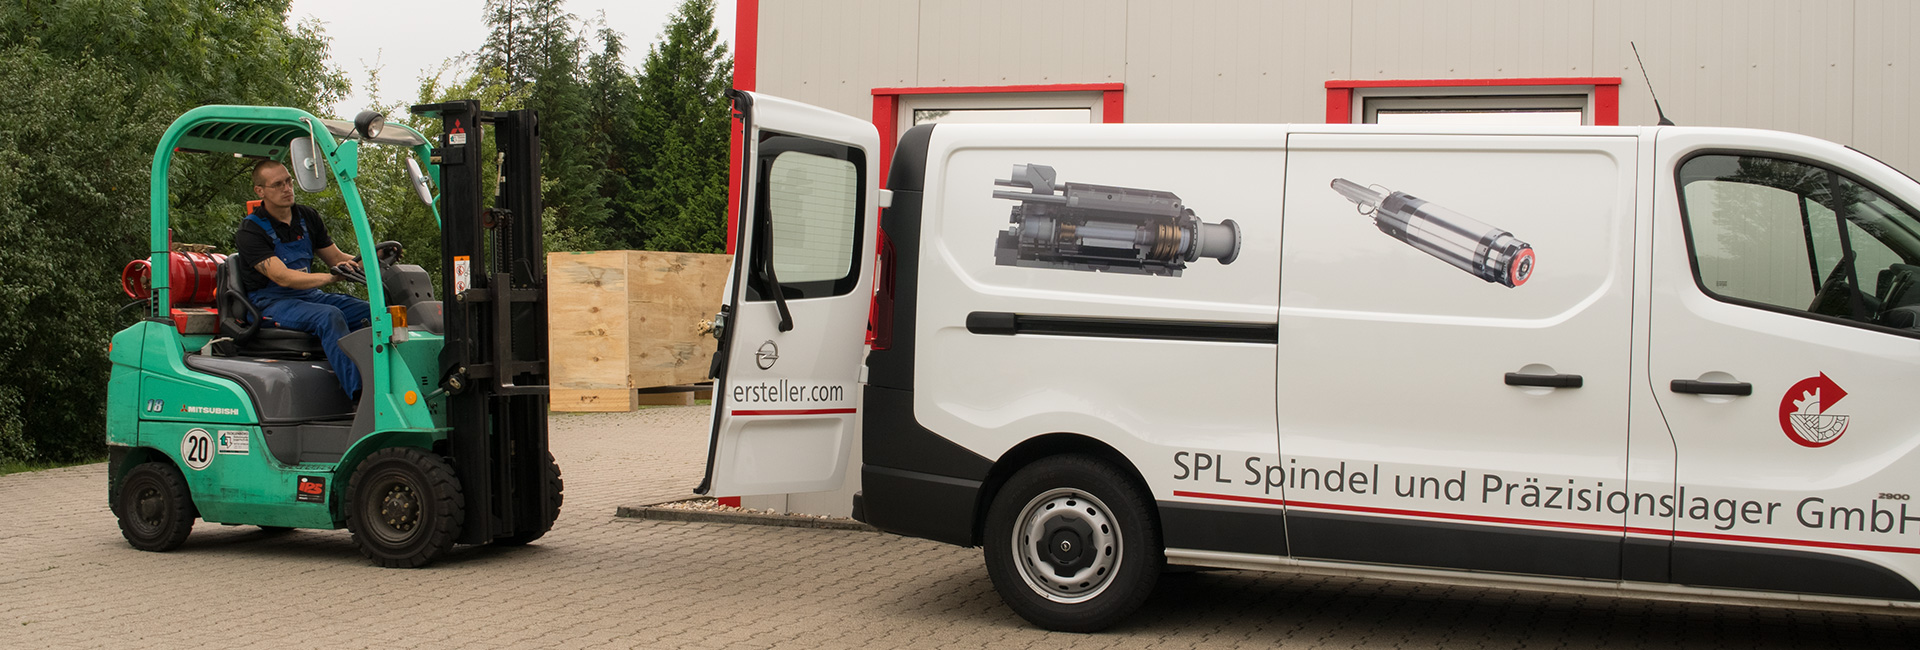 Transport | SPL Spindel und Präzisionslager GmbH